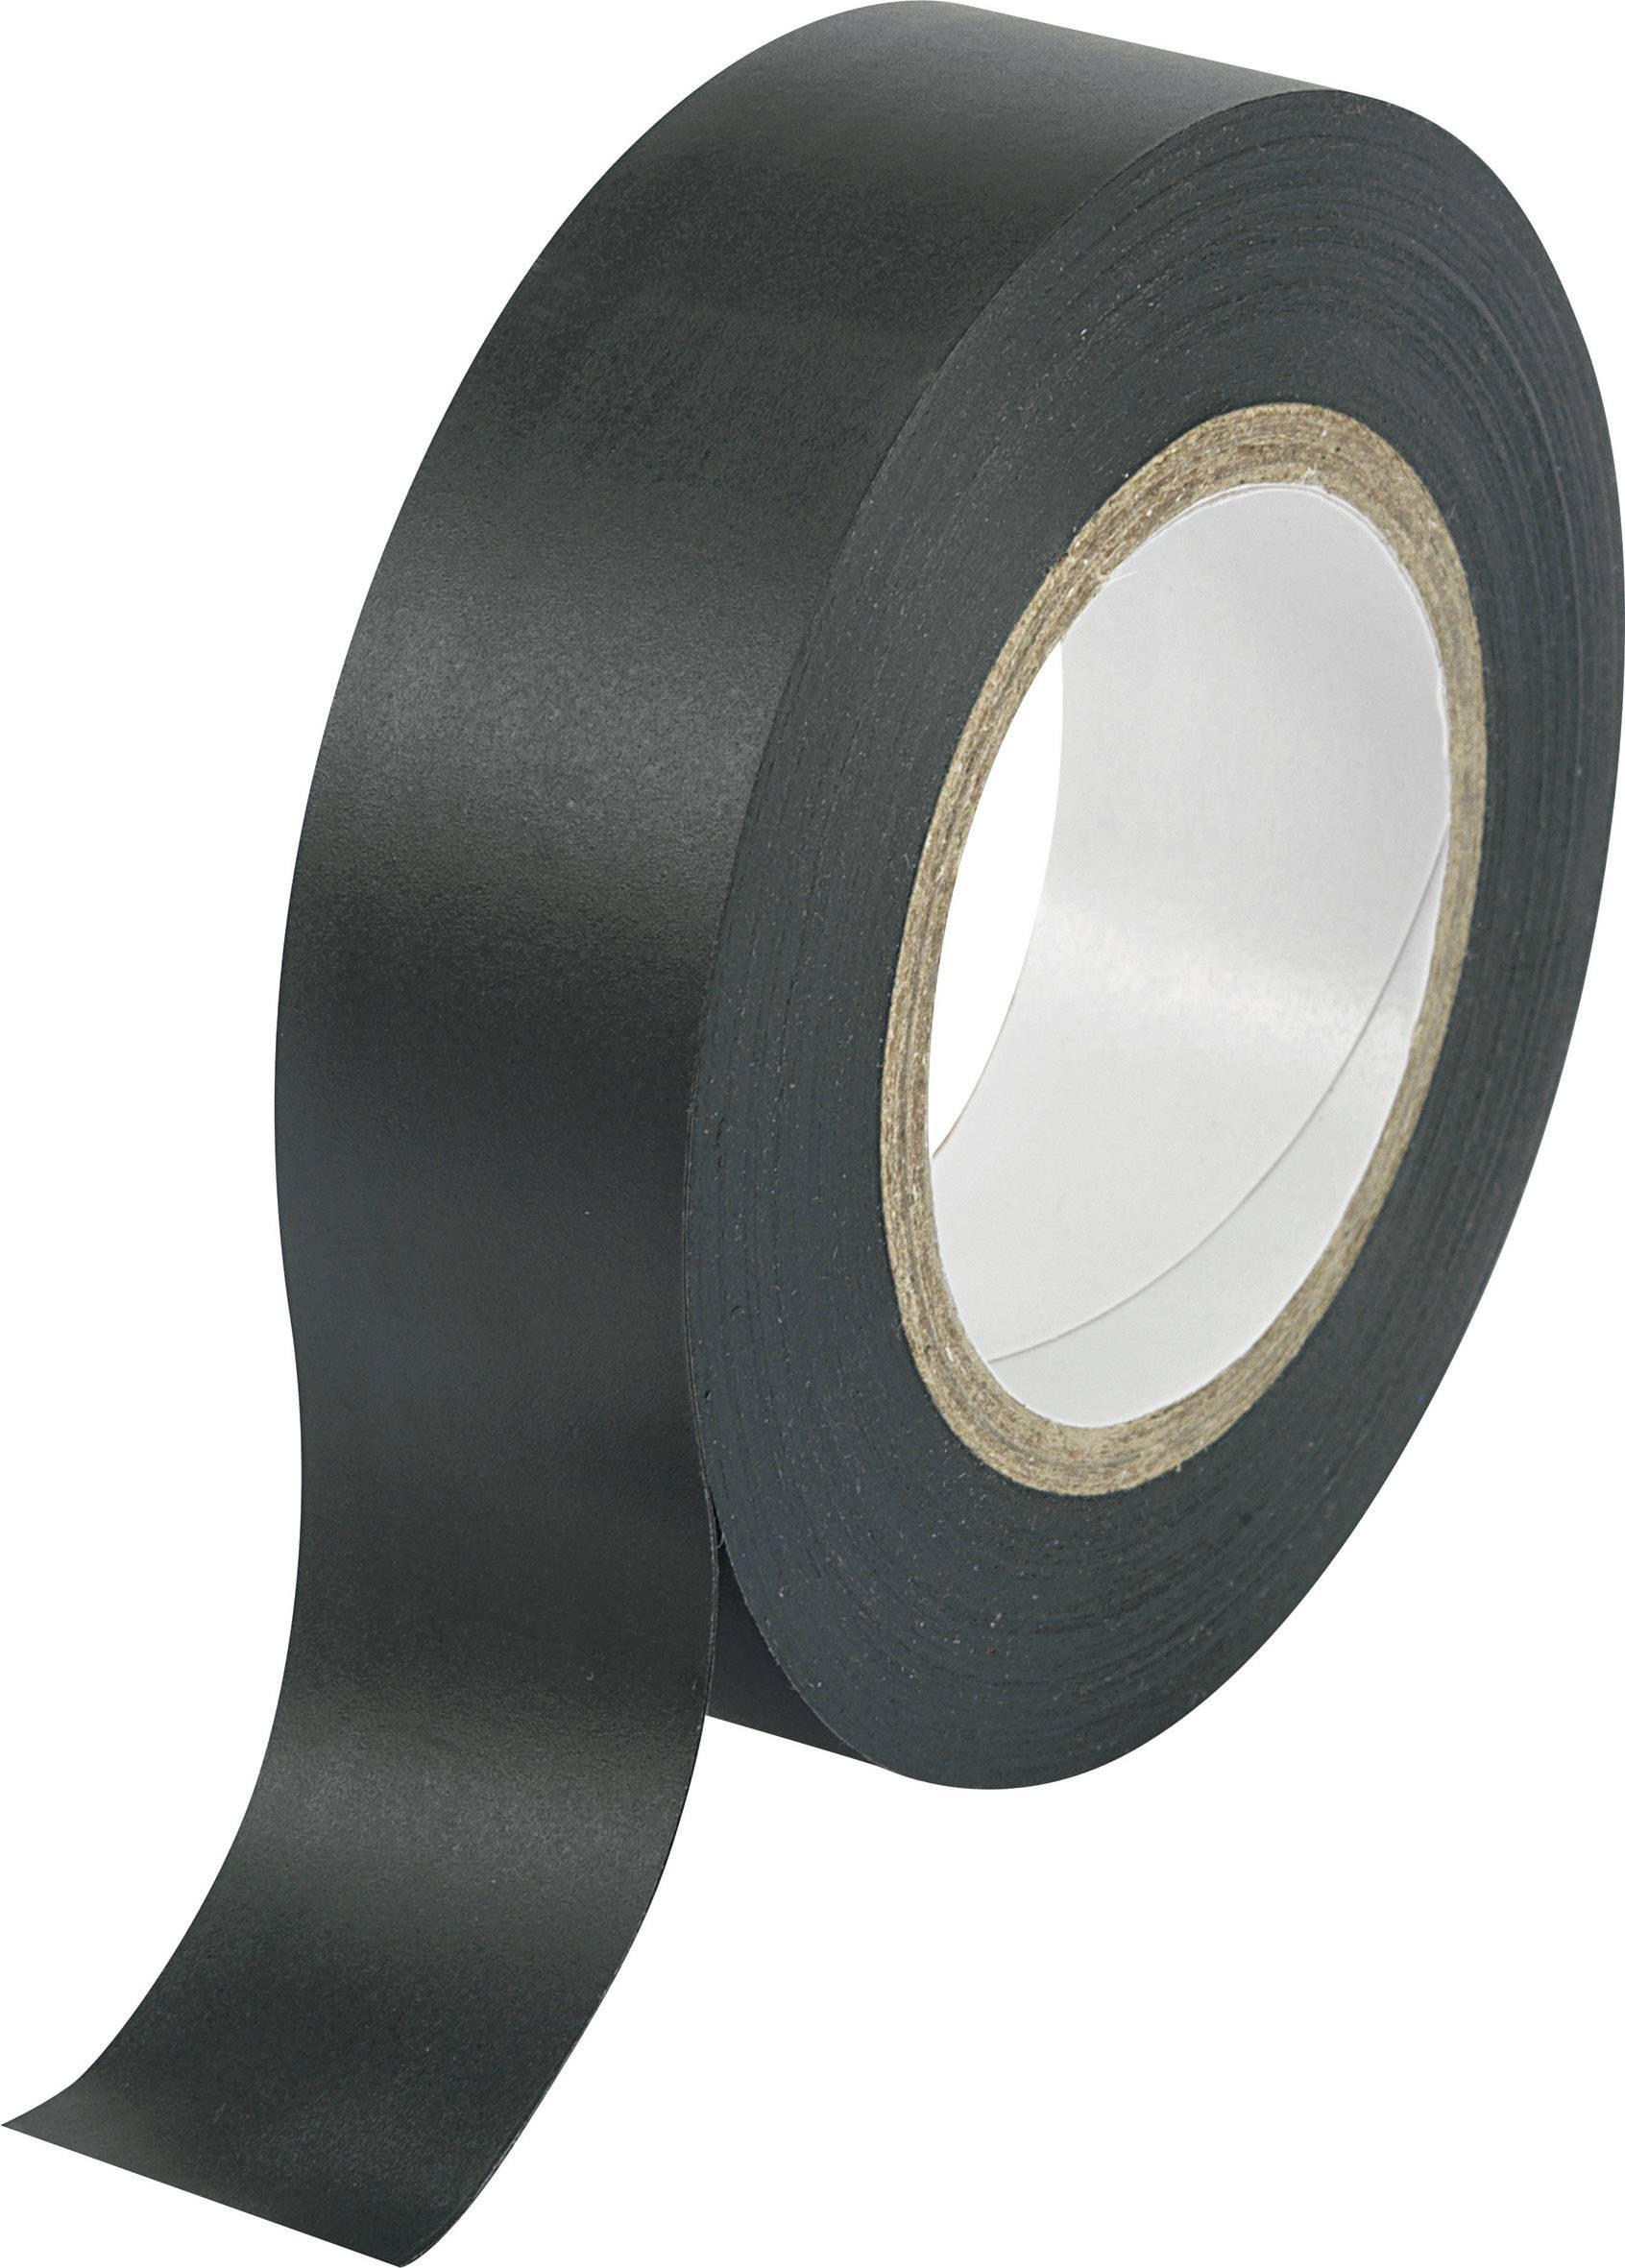 Izolační páska SW10-156, 19 mm x 10 m, černá